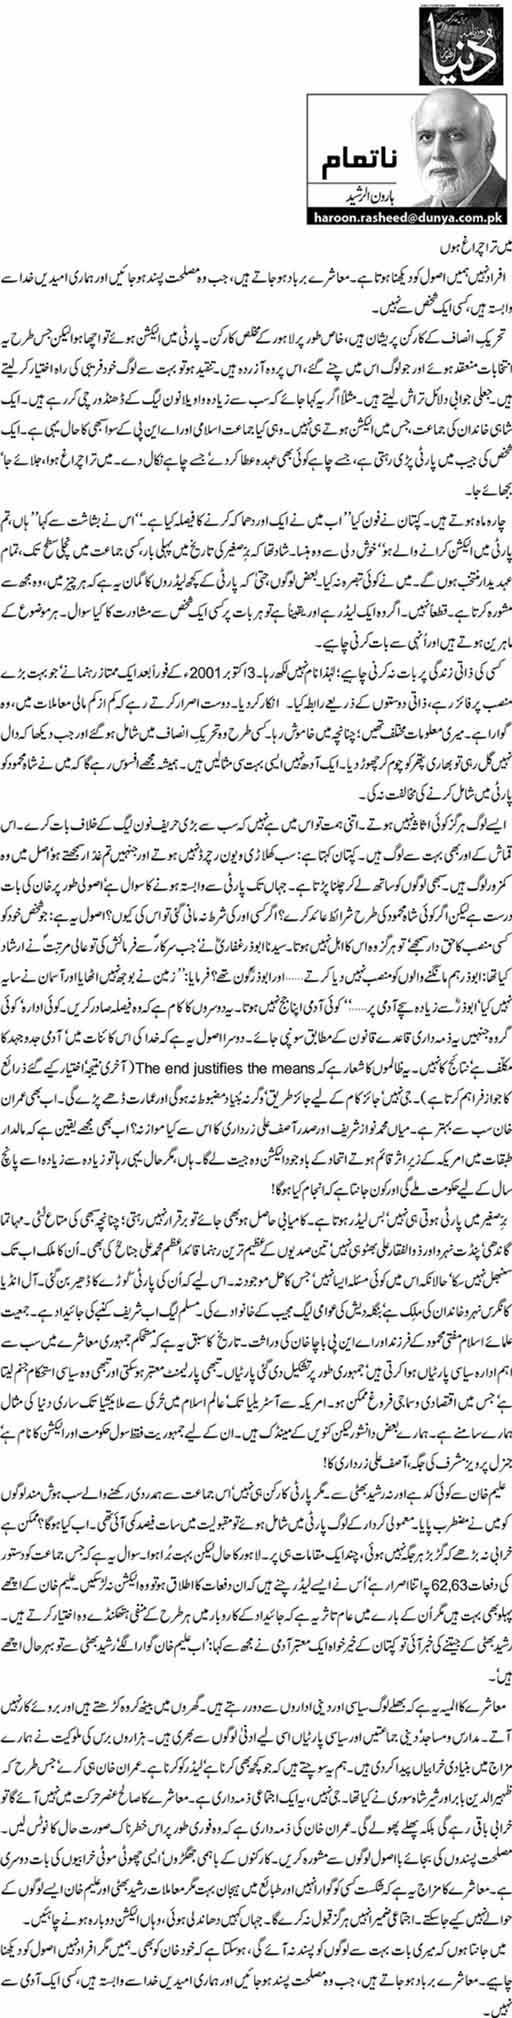 Main tera charagh hun - Haroon-ur-Rasheed